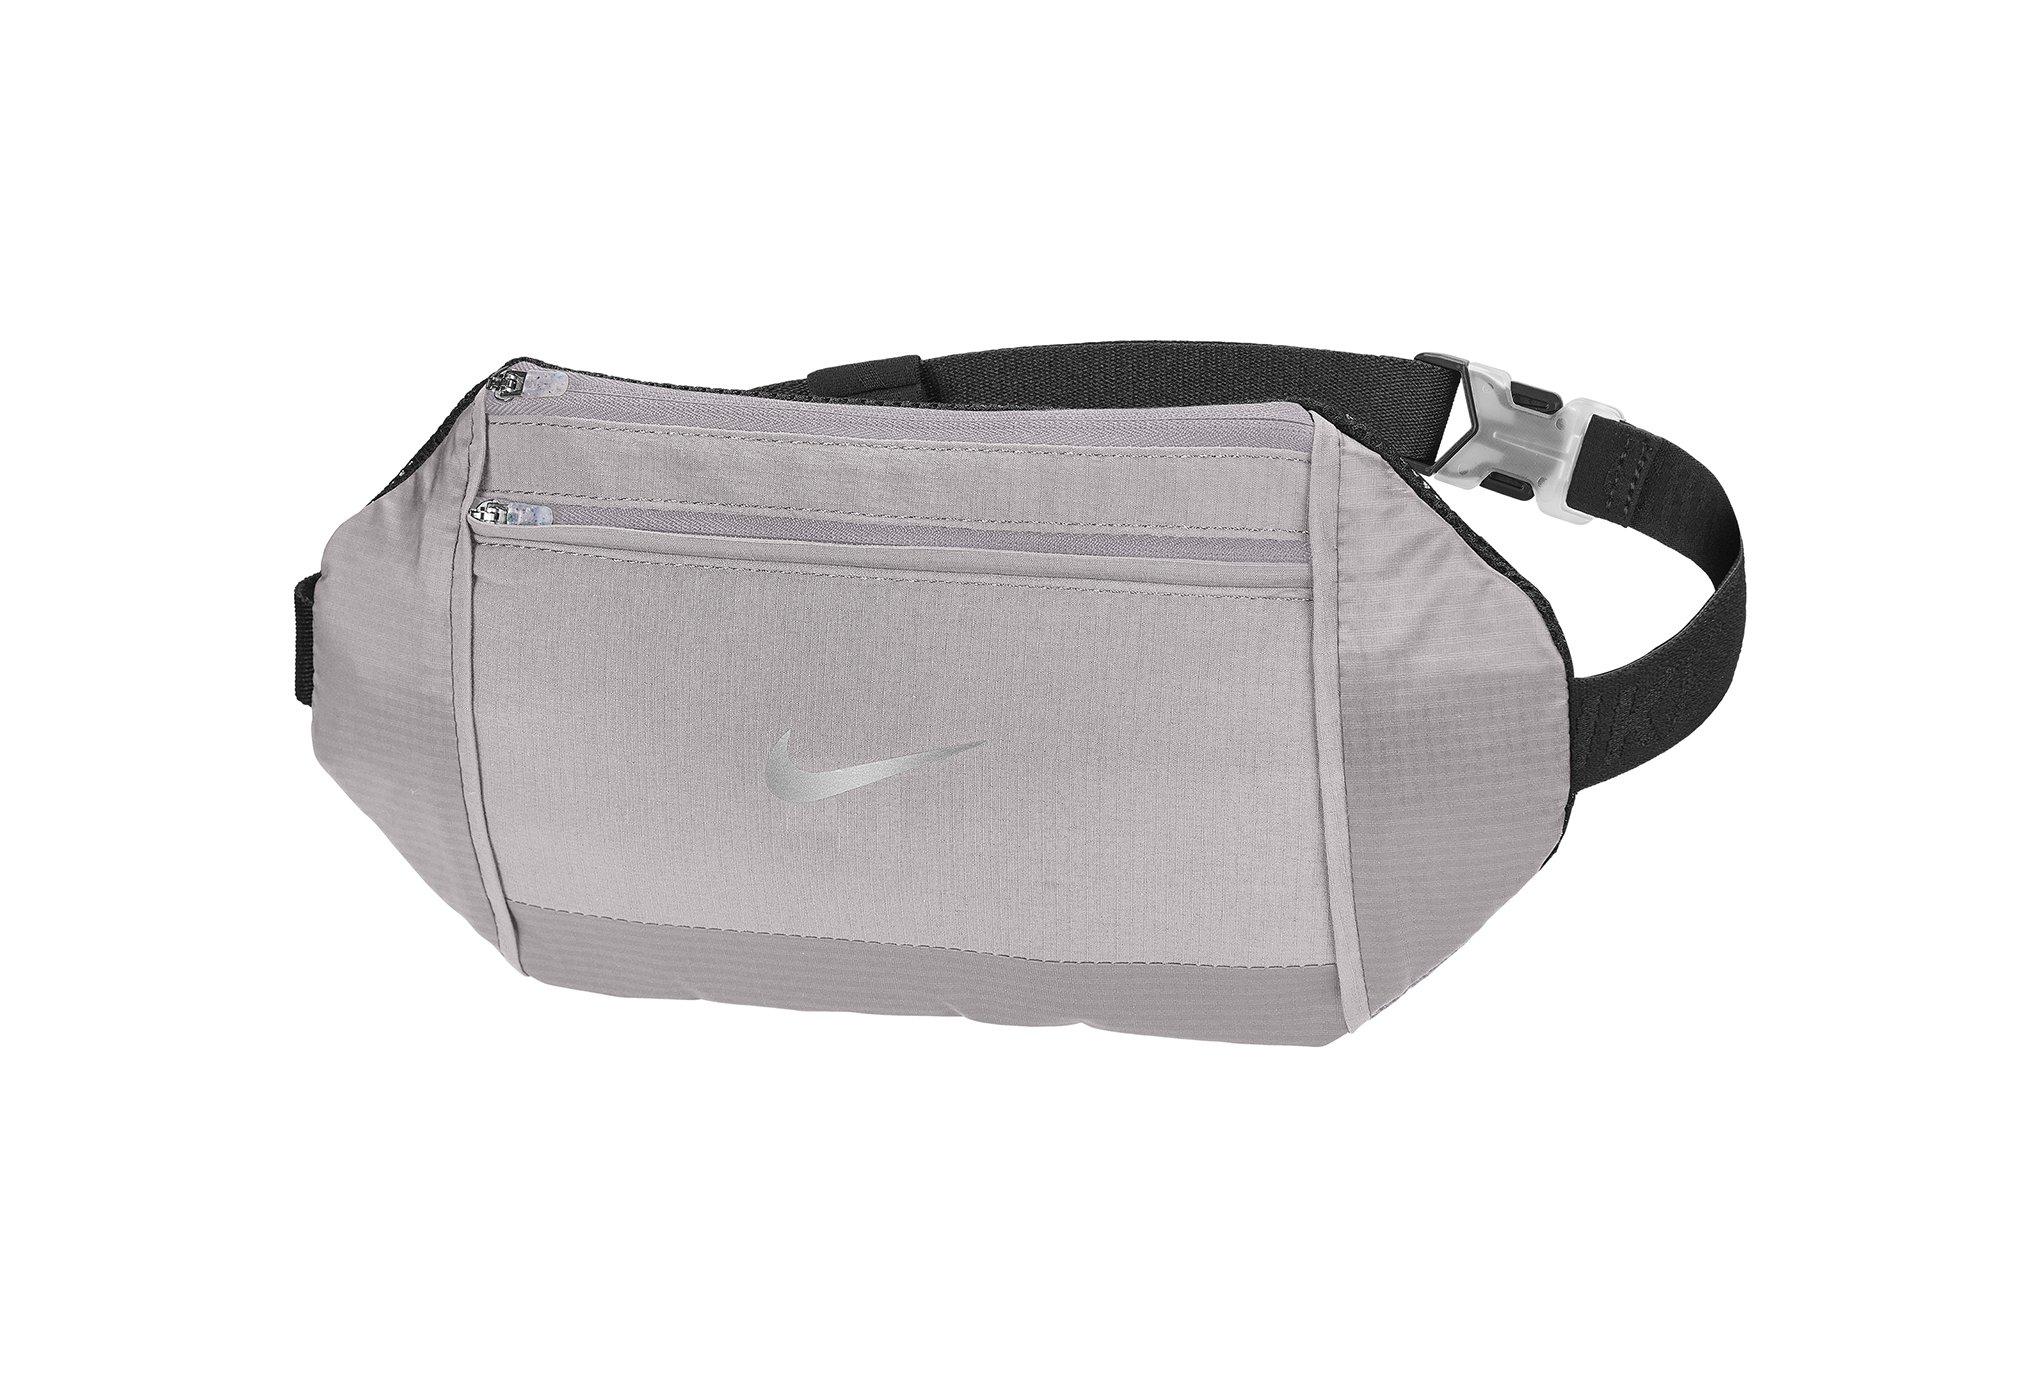 Nike Challenger Waistpack - Large Ceinture / porte dossard